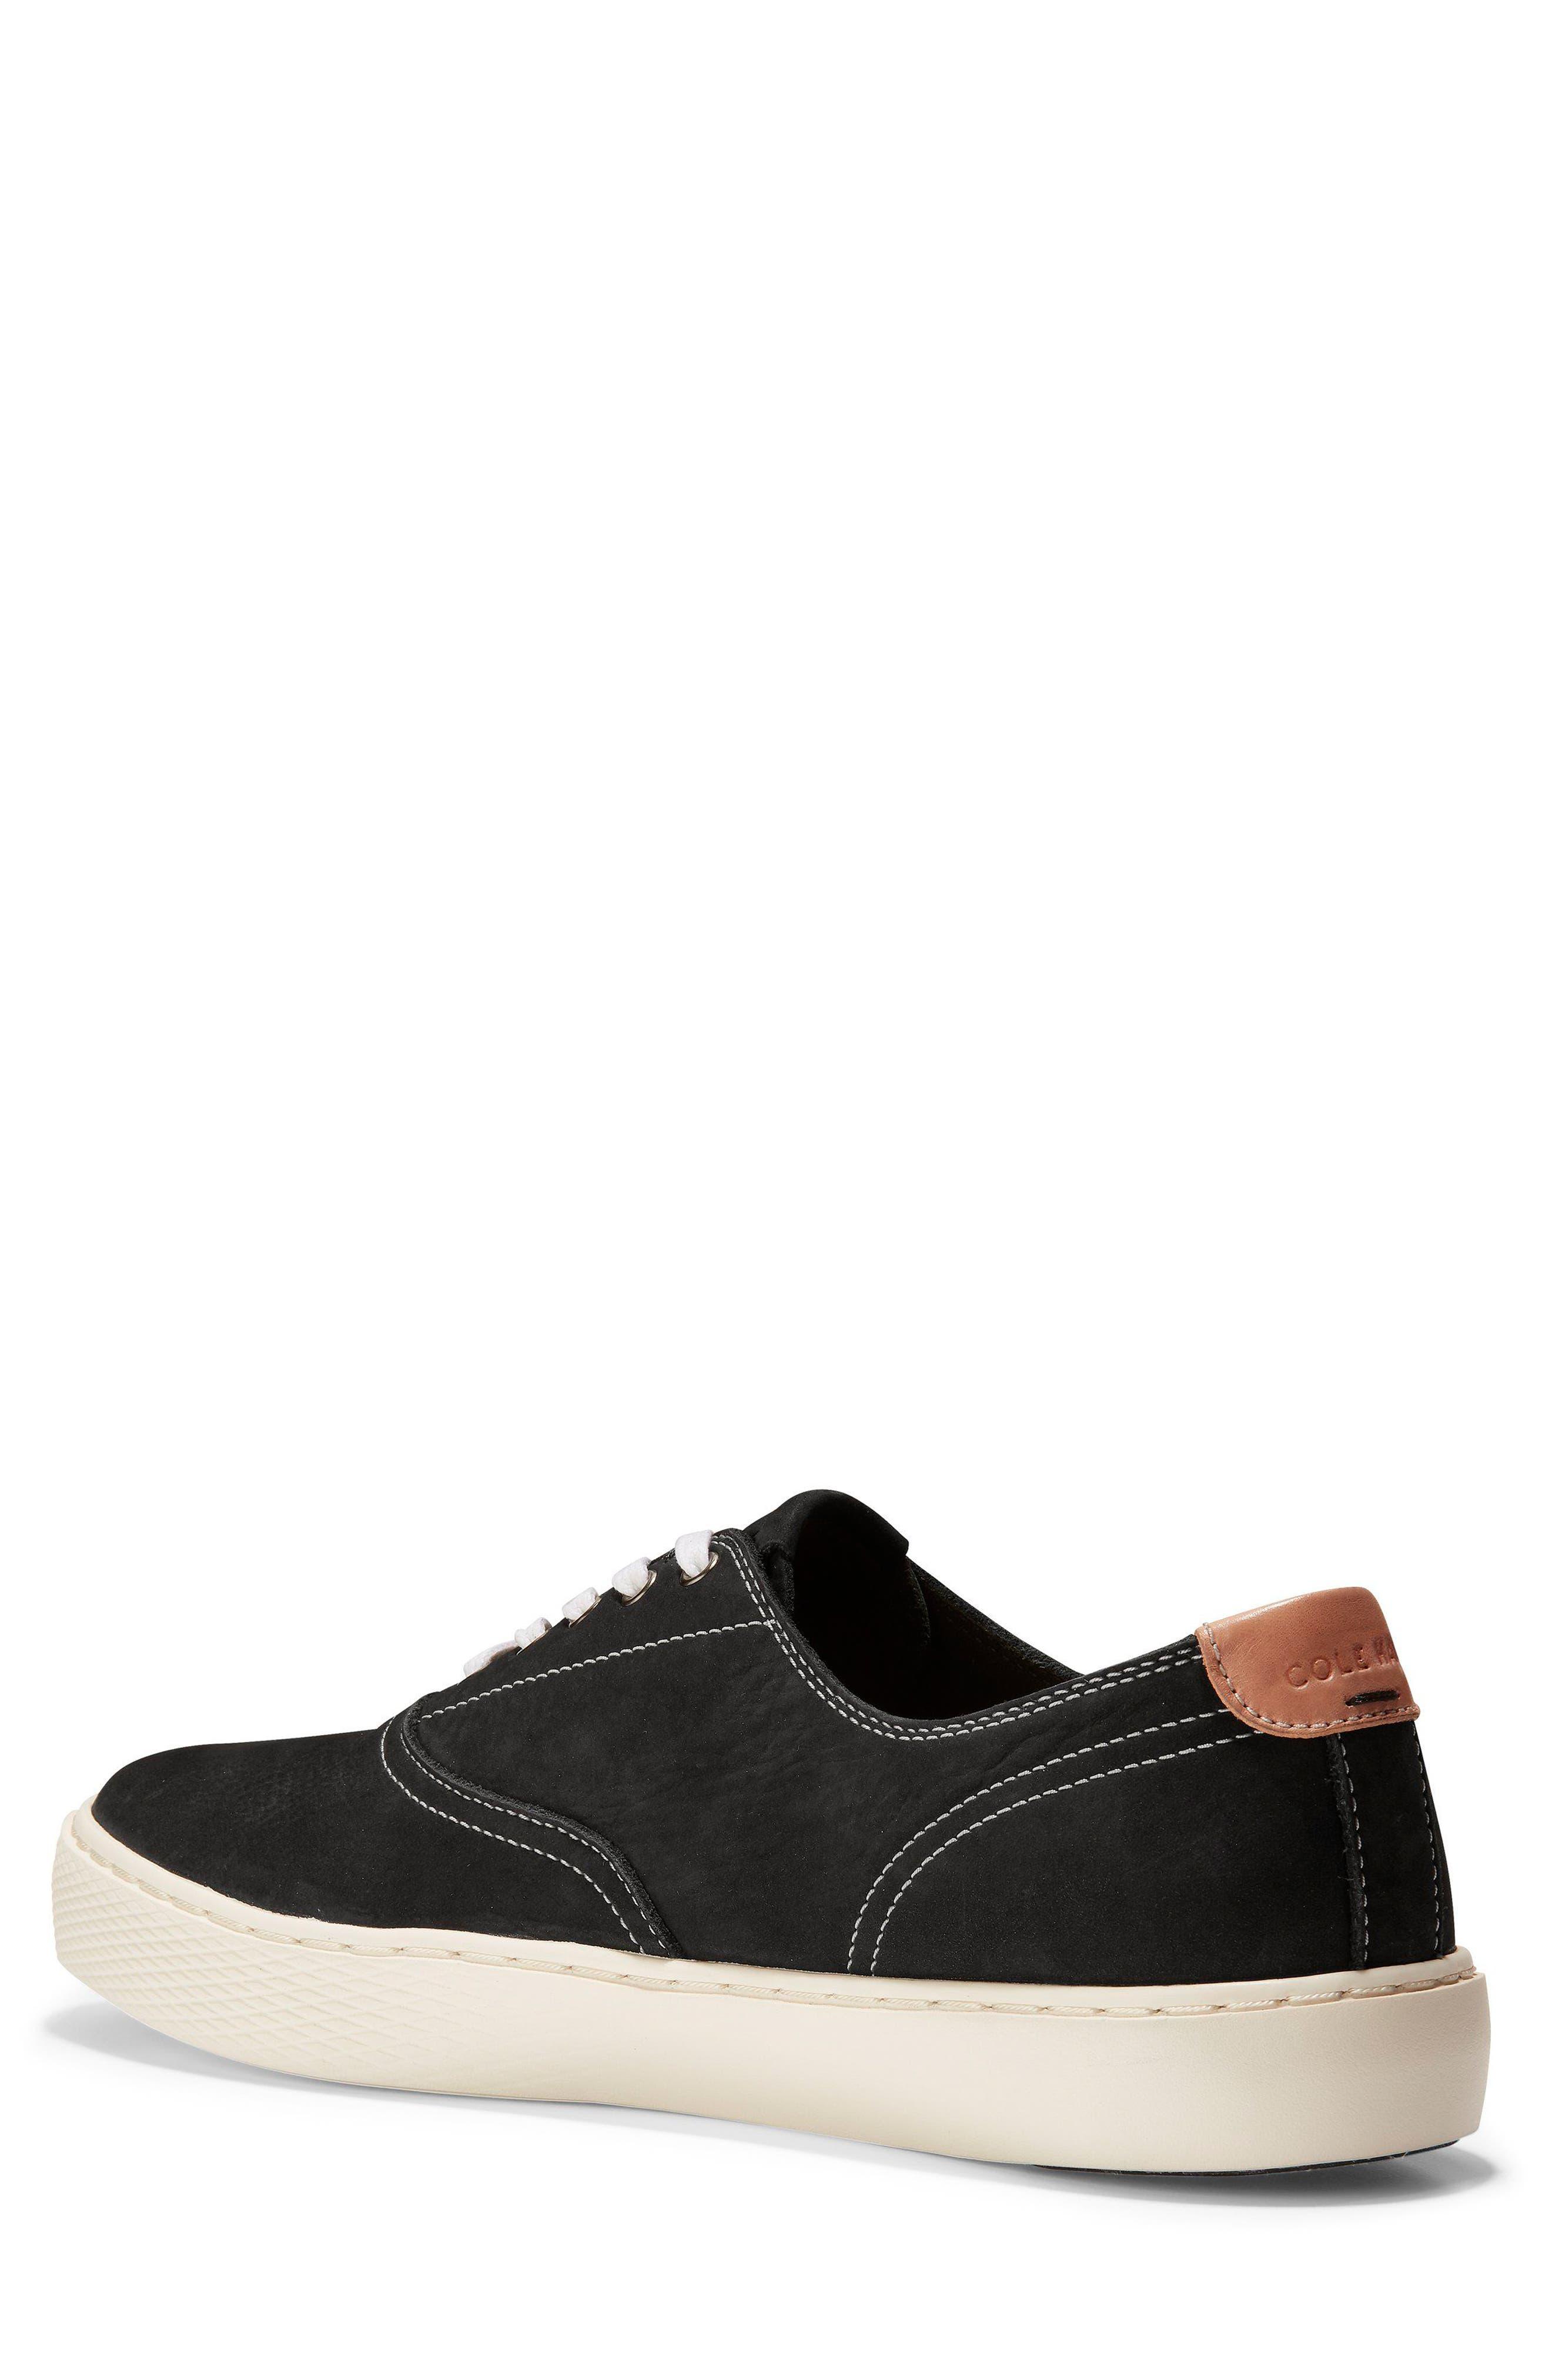 GrandPro Deck Low Top Sneaker,                             Alternate thumbnail 2, color,                             001